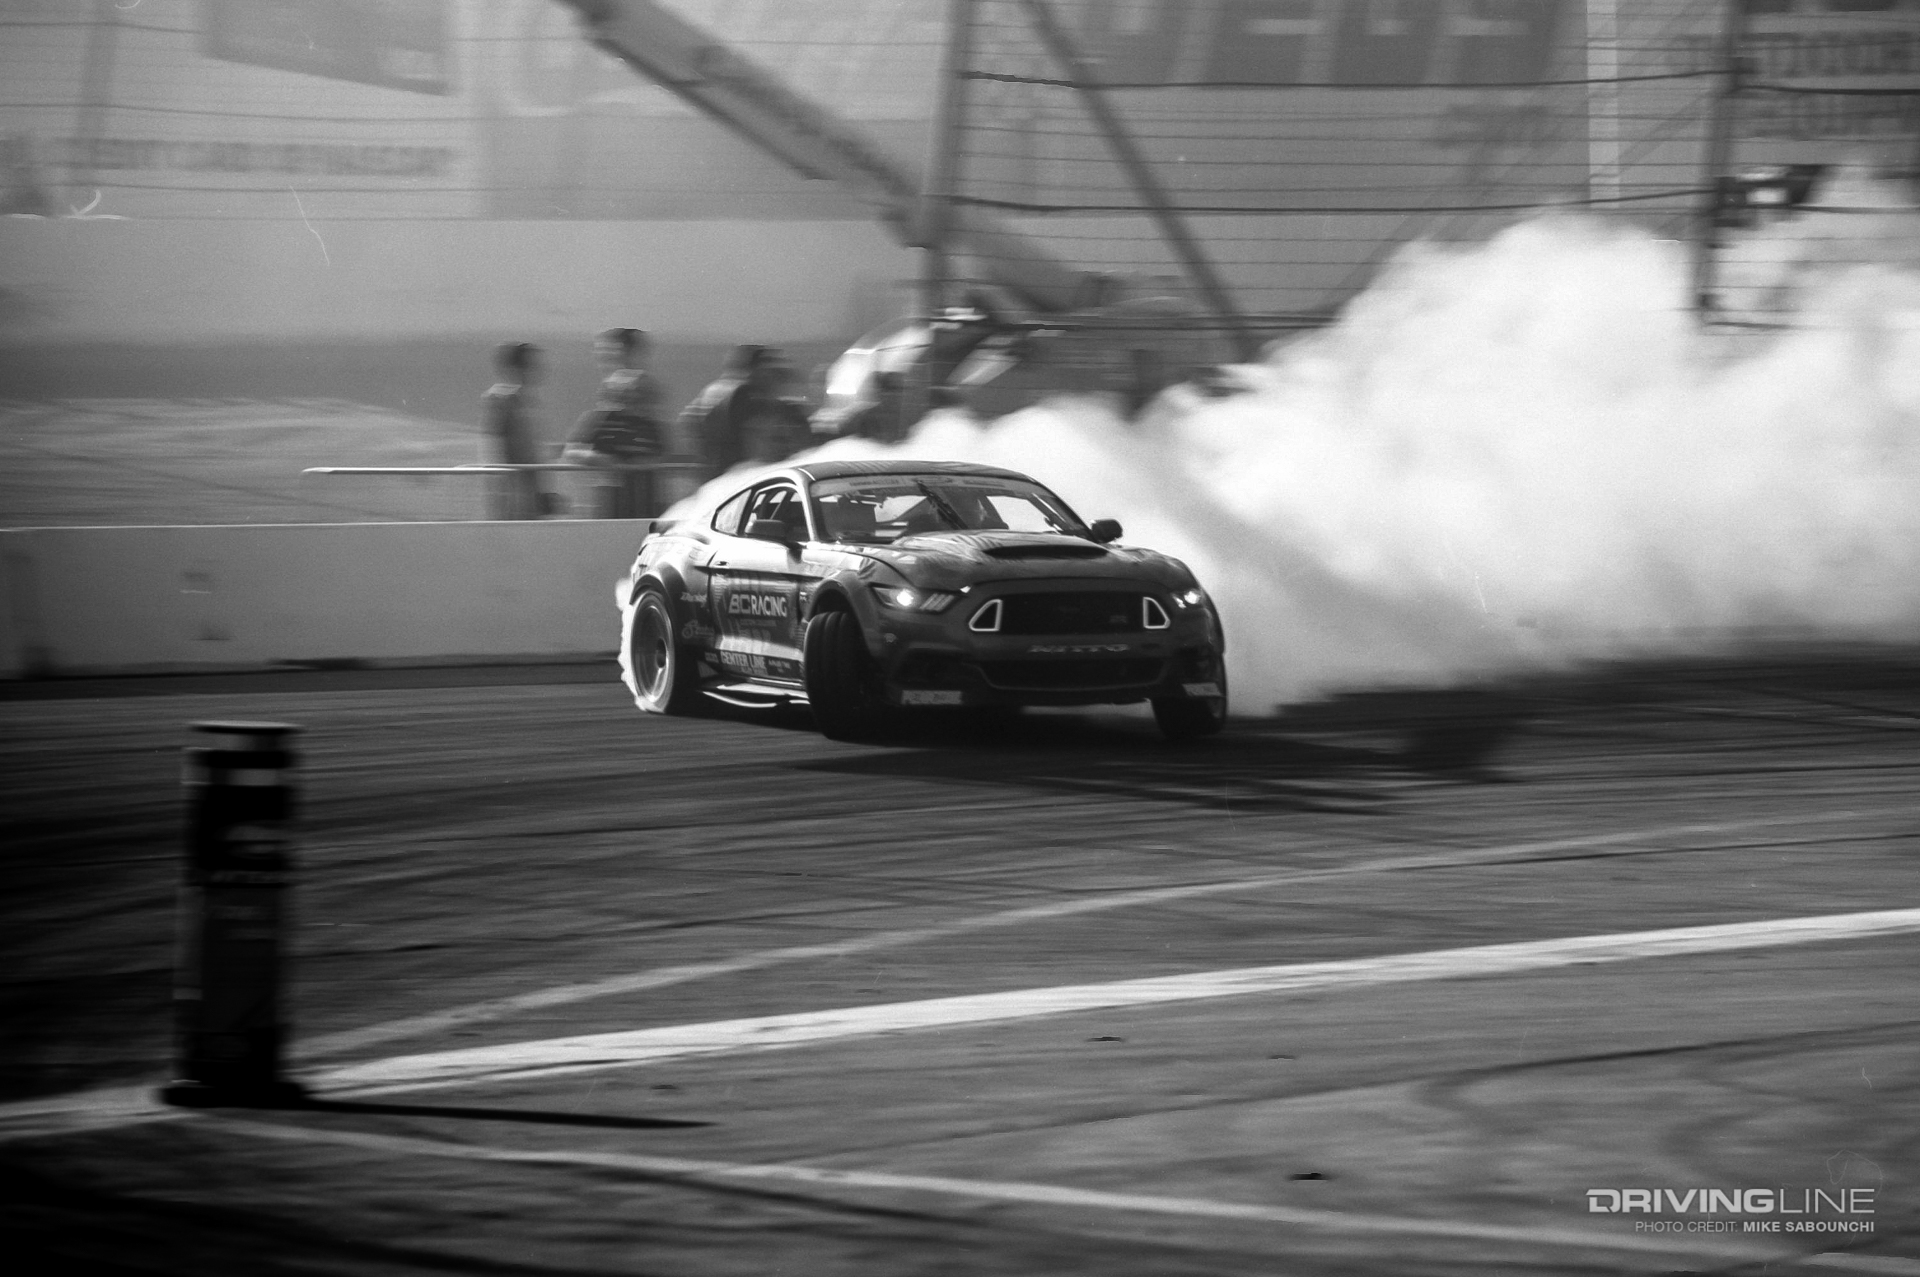 Caught On Film Photographing Formula Drift Irwindale On Film Drivingline